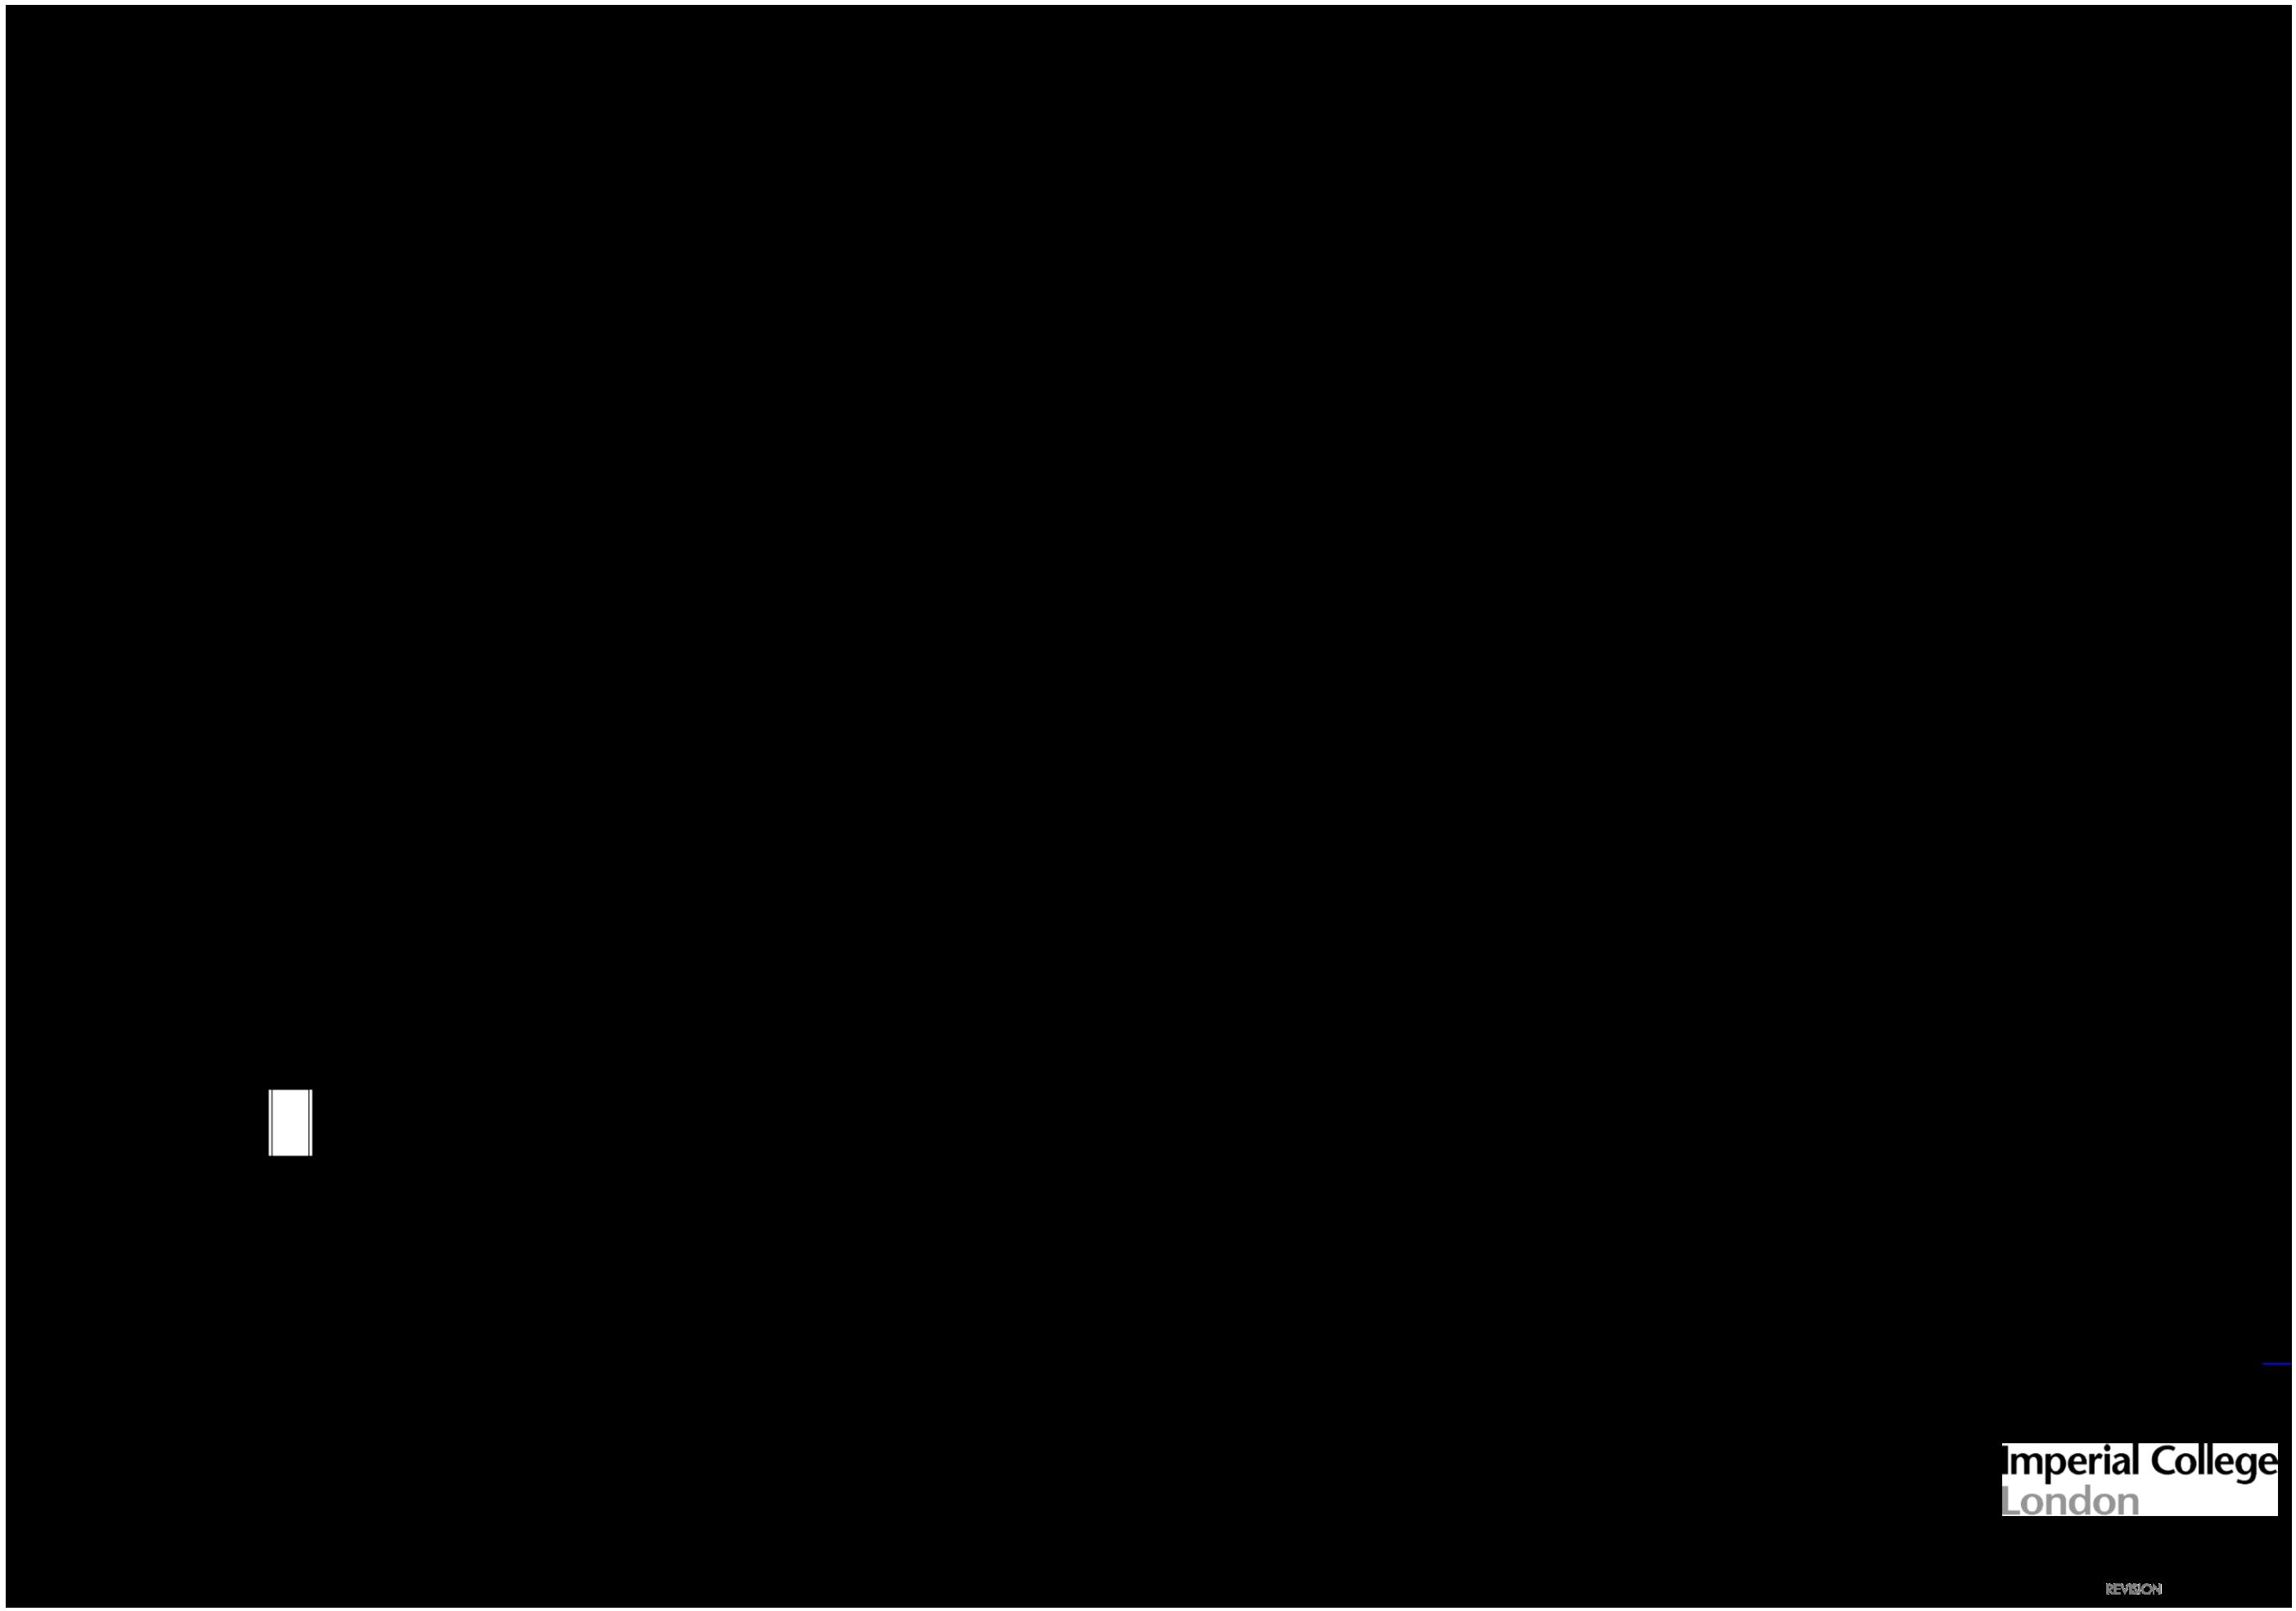 banner black and white John Bertolaso